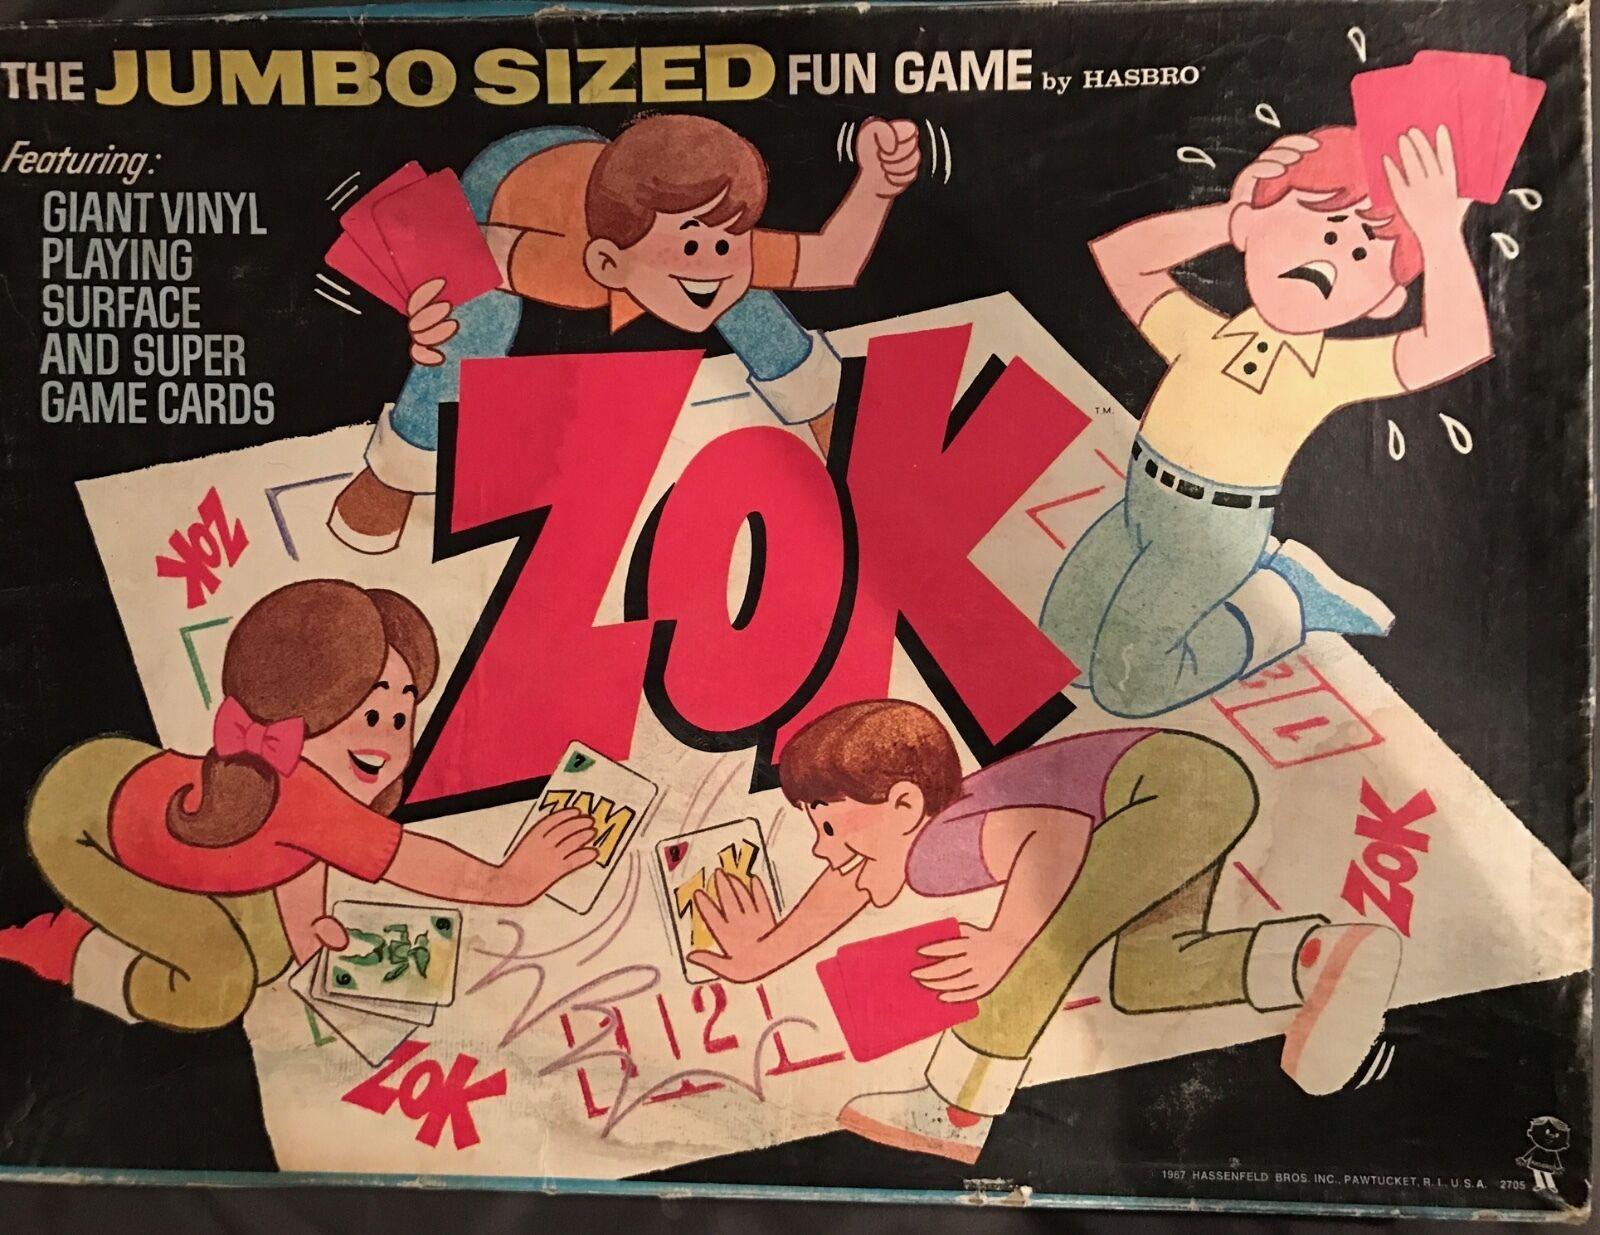 VINTAGE 1966 Hasbro ZOK Super hero jumbo Dimensioned board game MIB. Marvelmania era